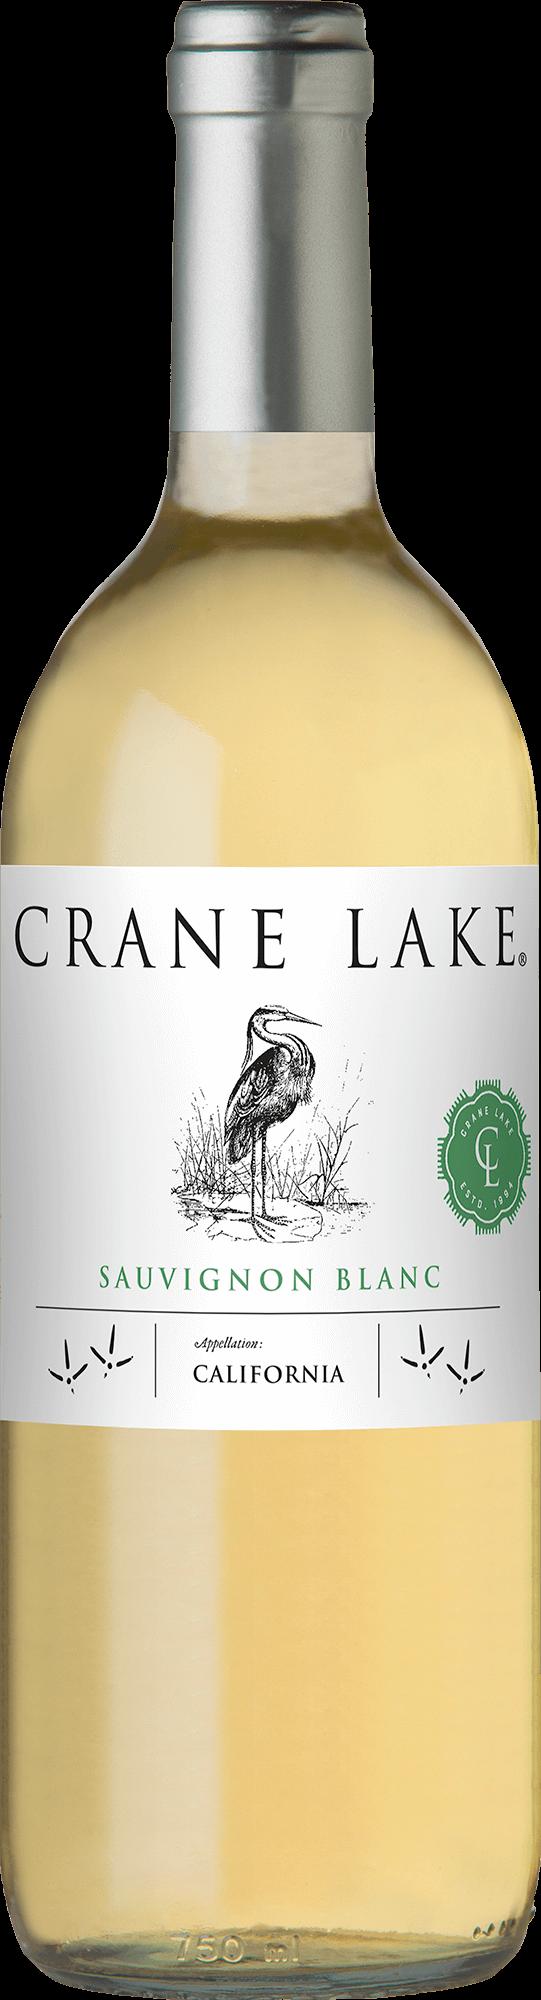 Crane Lake Sauvignon Blanc Bottleshots